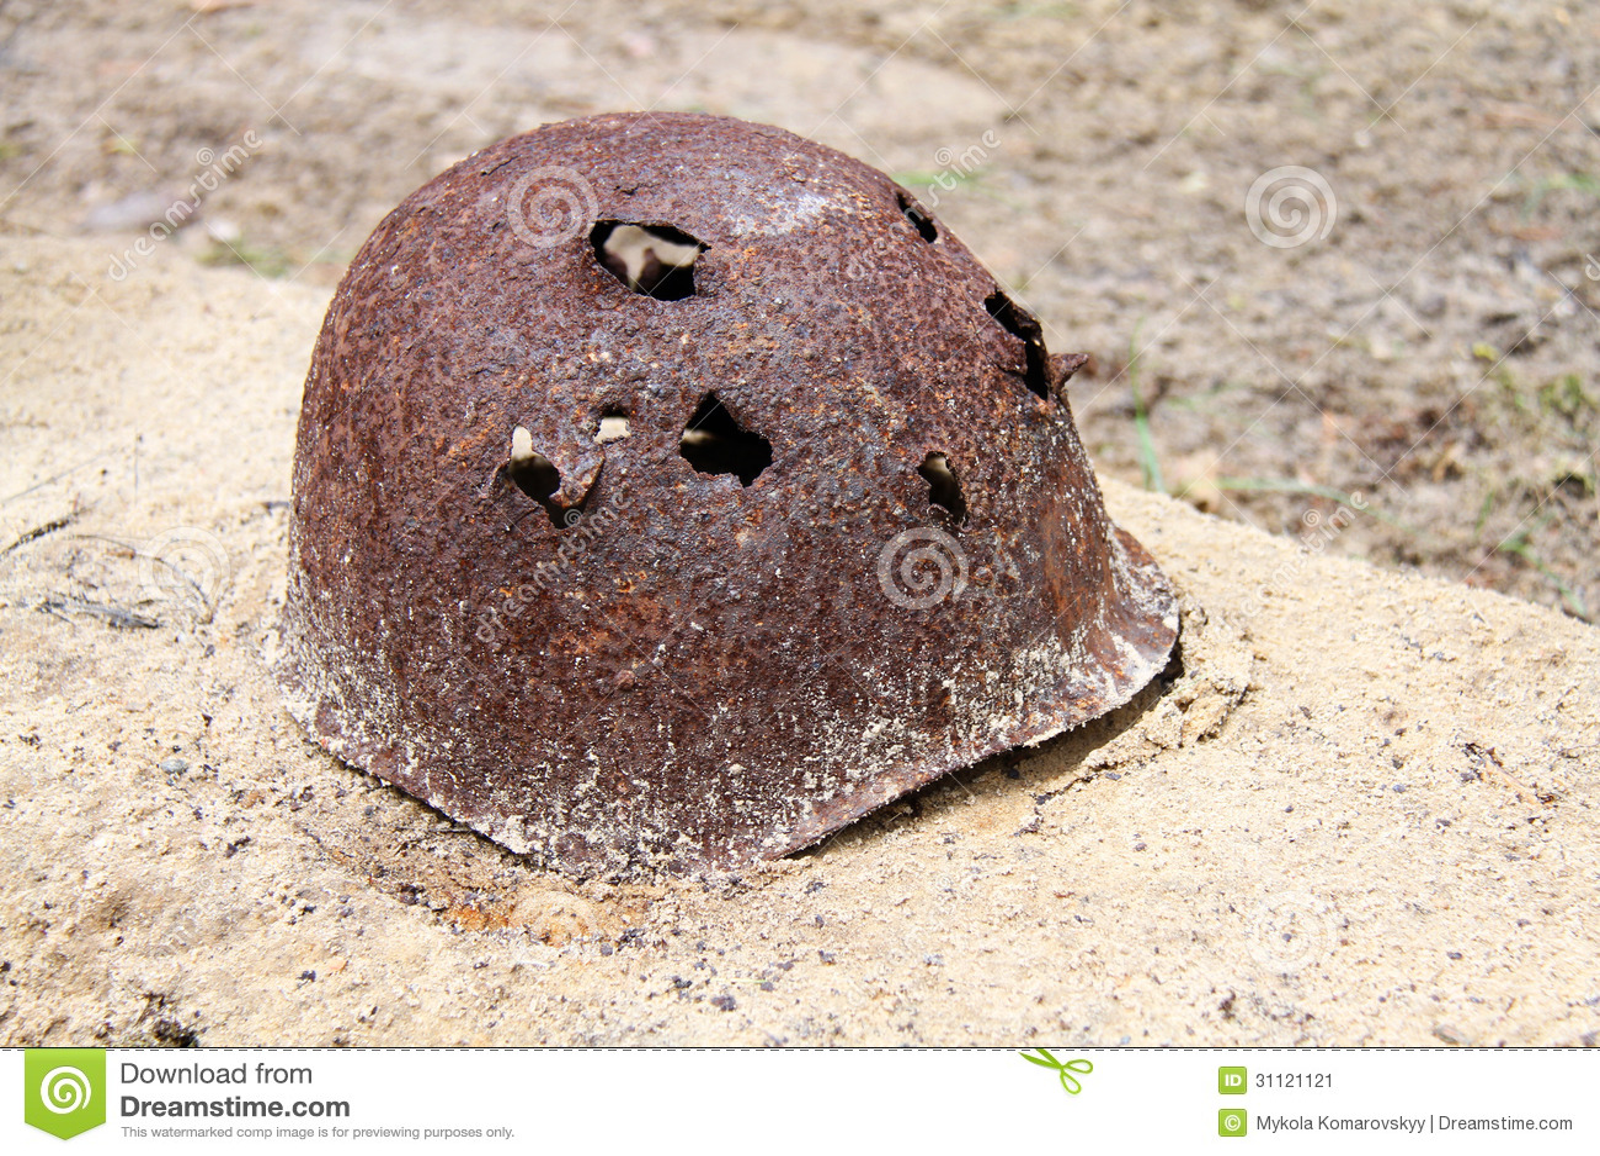 Rusty Military Helmet Stock Image Image 31121121